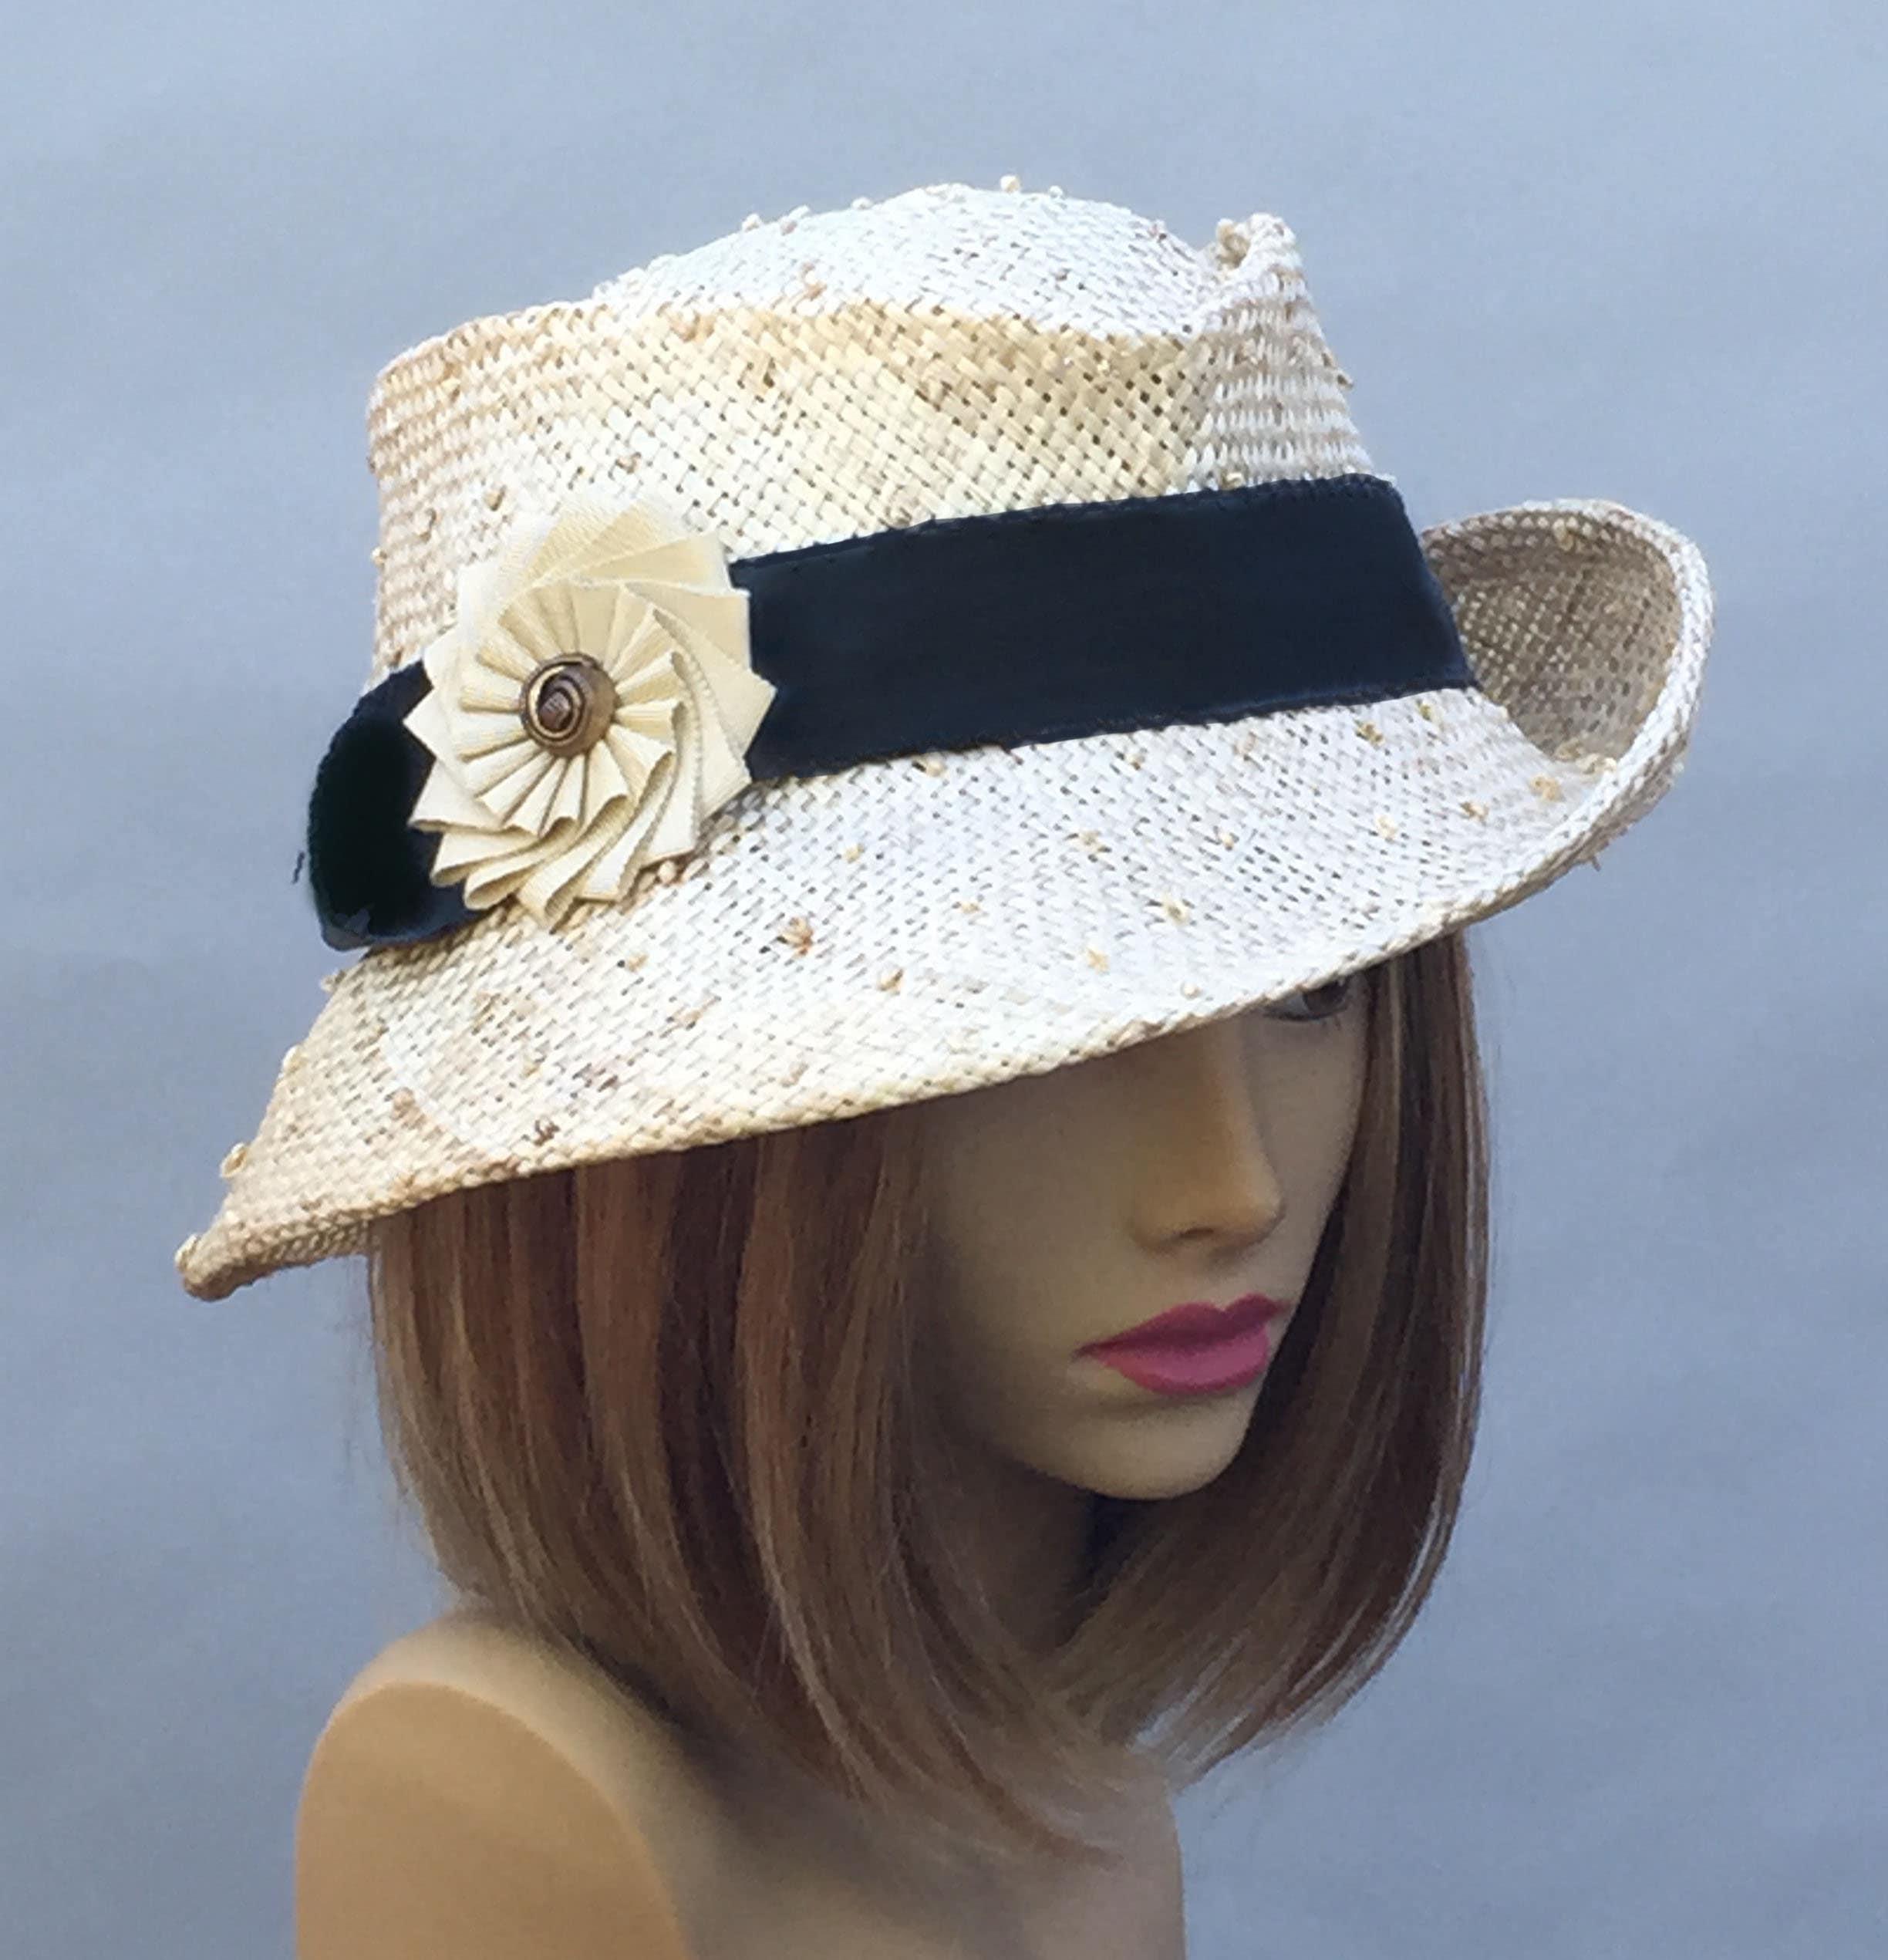 844659cc7 Gina, beautiful straw fedora with black grosgrain ribbon trim and ...